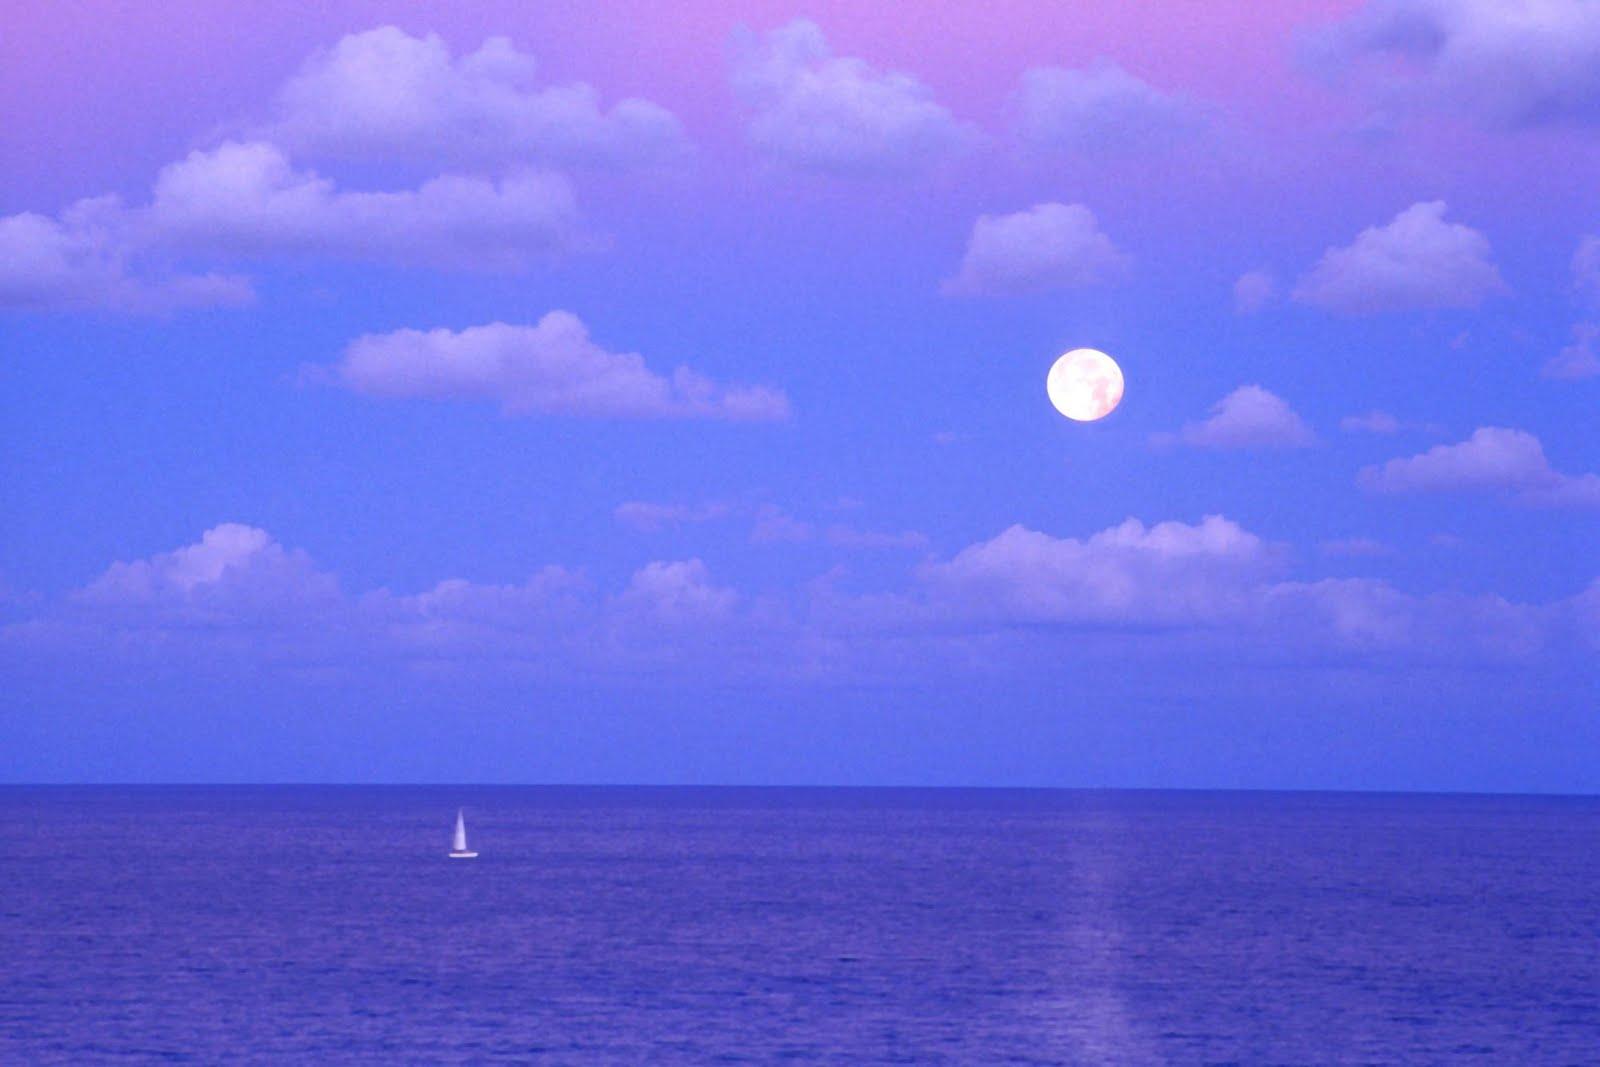 http://2.bp.blogspot.com/_5dxcnrYslUE/SwkP3v1QT5I/AAAAAAAAF1U/zOES_7zUaao/s1600/Enchanted+Moonrise,+Cancun,+Mexico.jpg